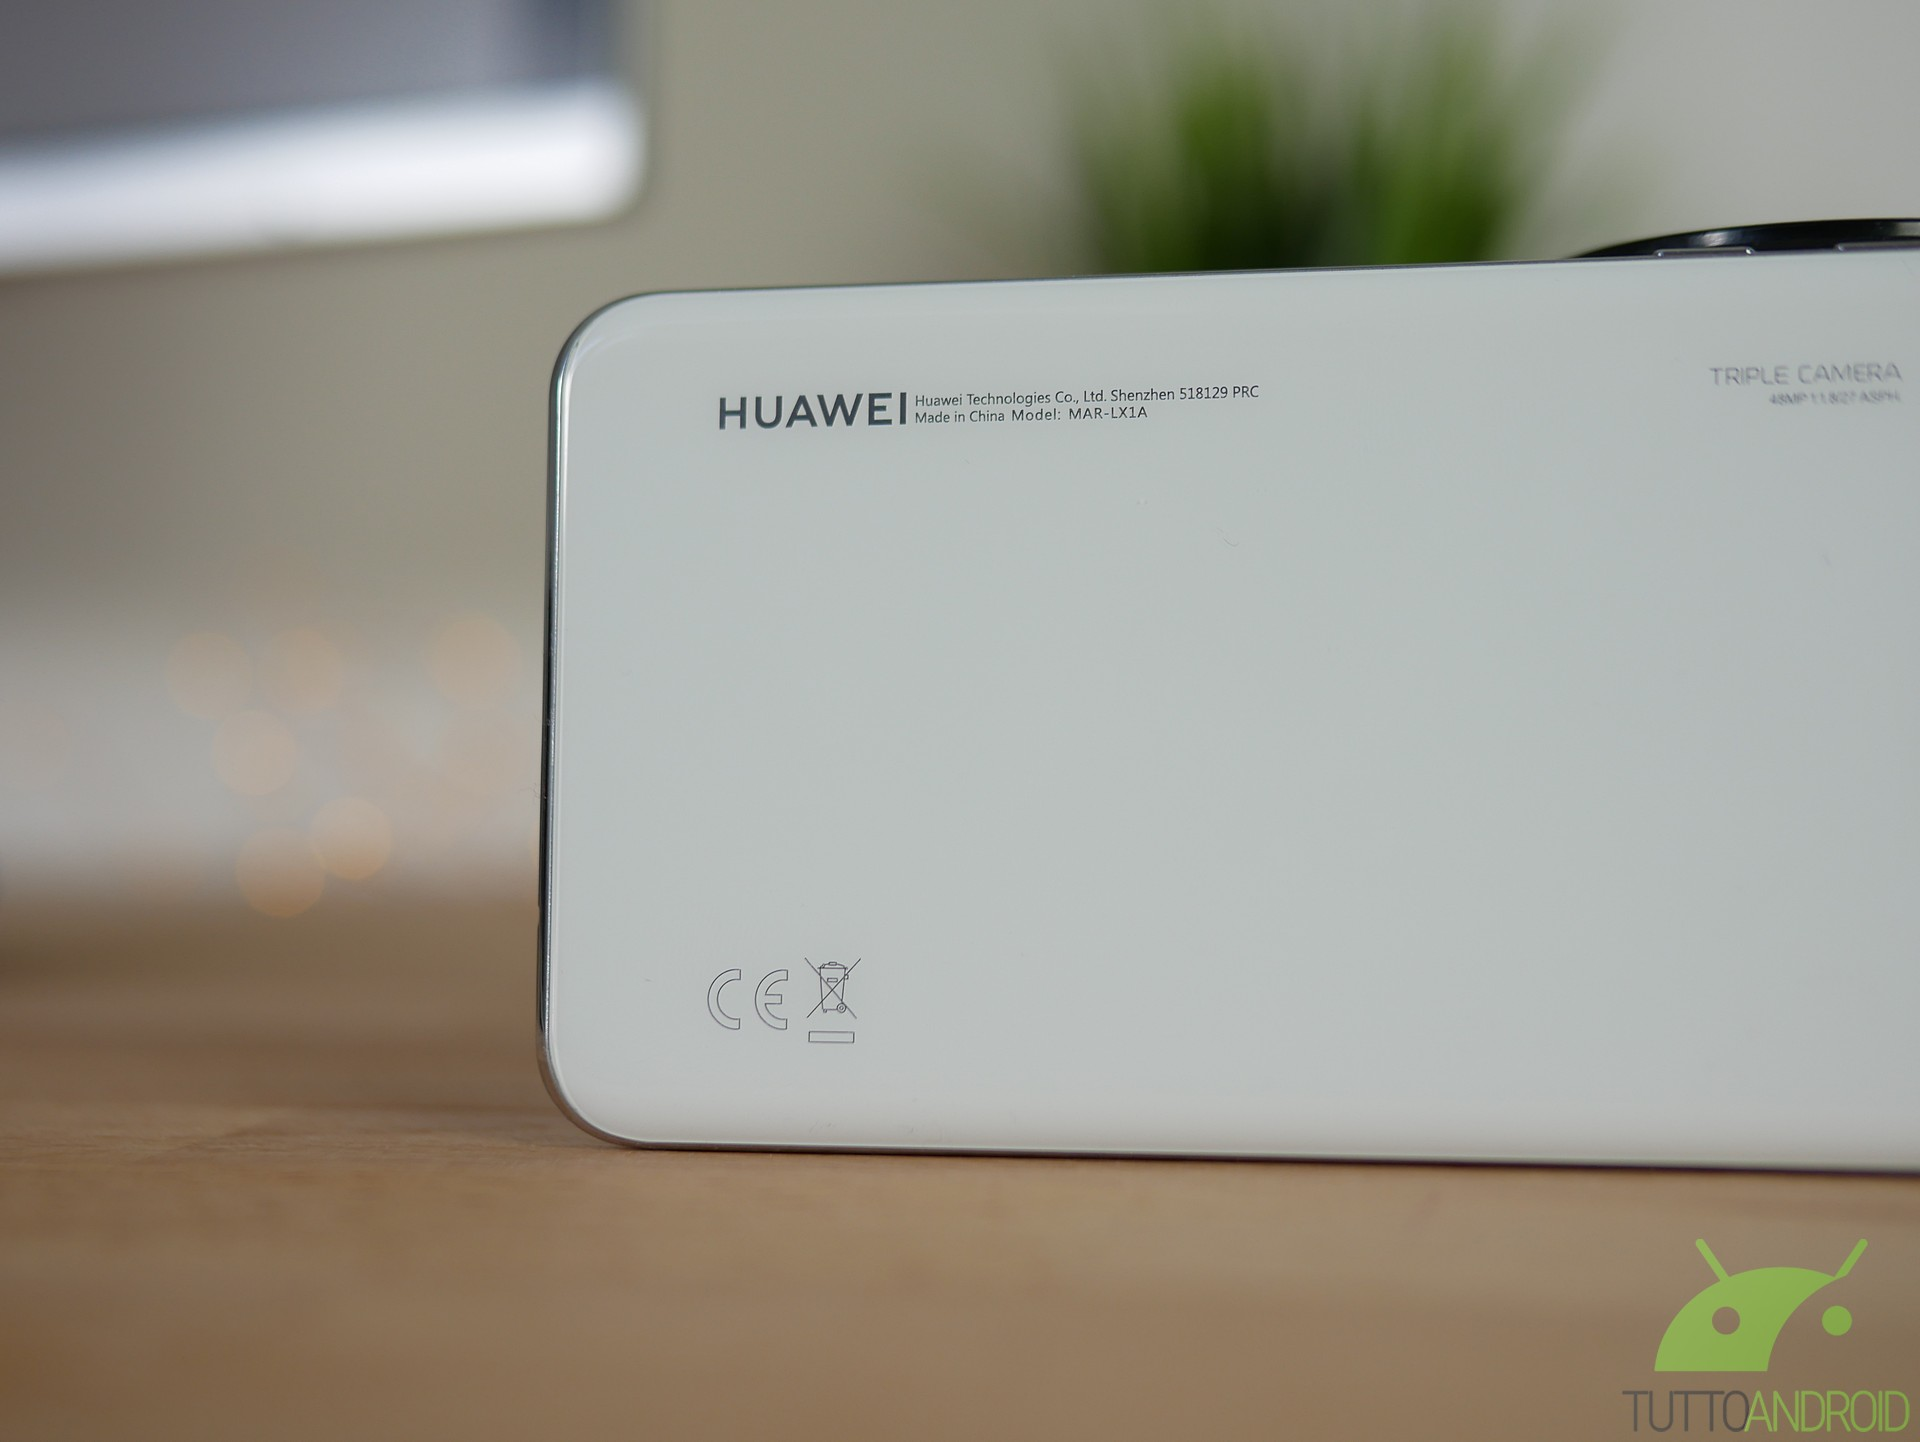 Huawei P30 Lite e Huawei Y9 2019 stanno ricevendo la EMUI